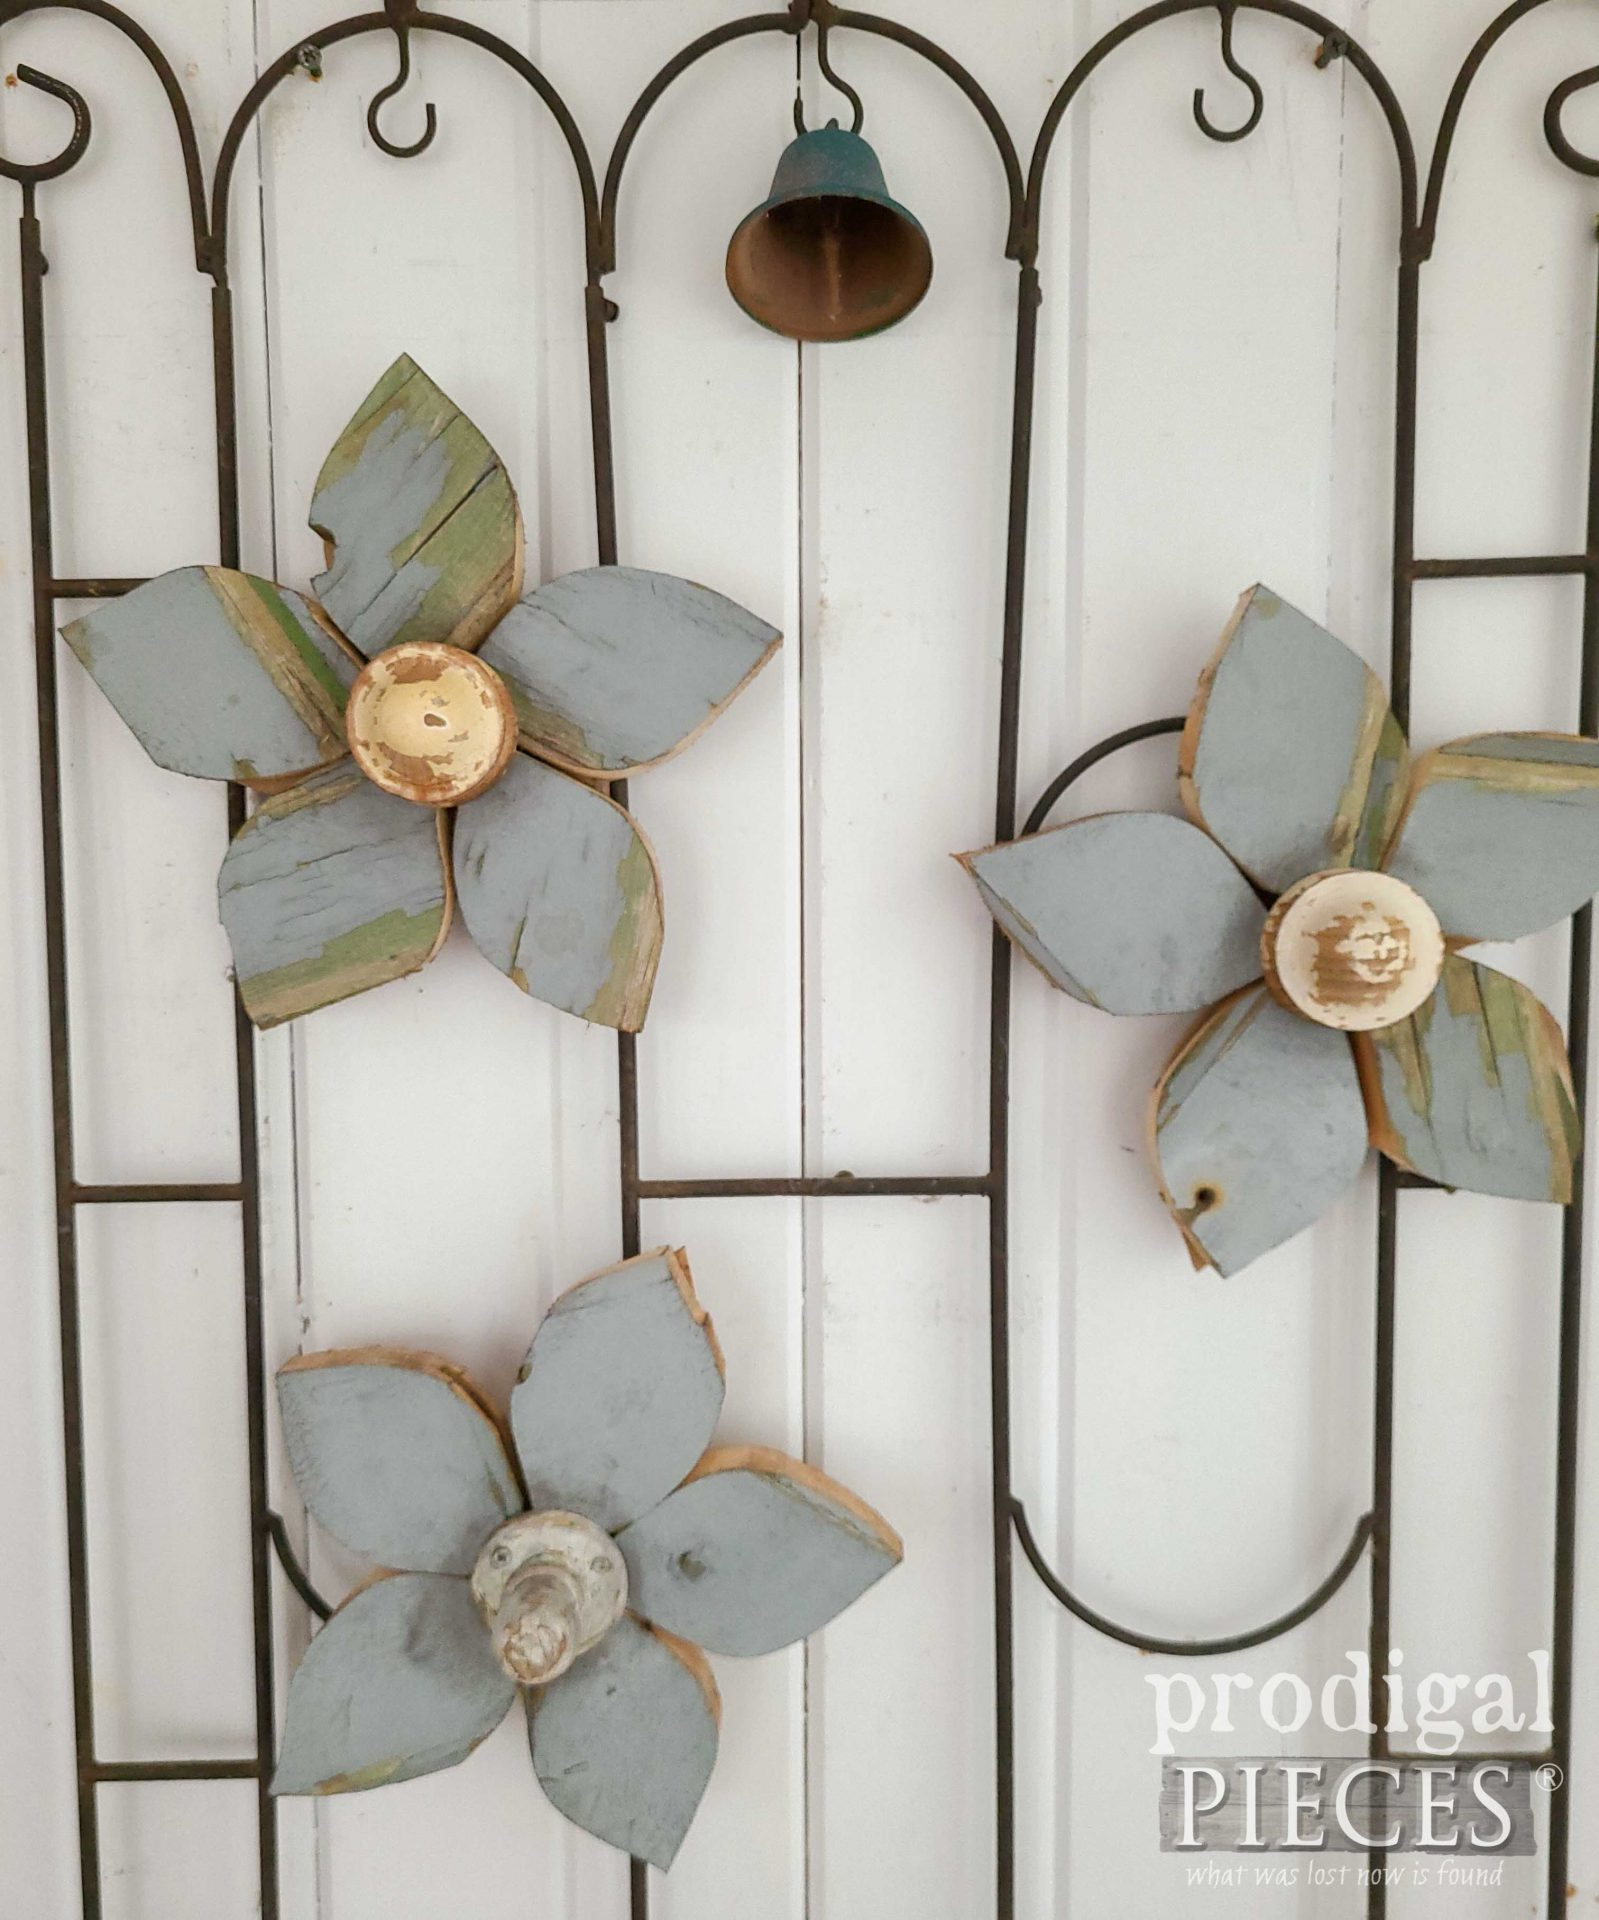 Handmade Wood Flowers on Salvaged Garden Art by Larissa of Prodigal Pieces | prodigalpieces.com #prodigalpieces #art #home #homedecor #farmhouse